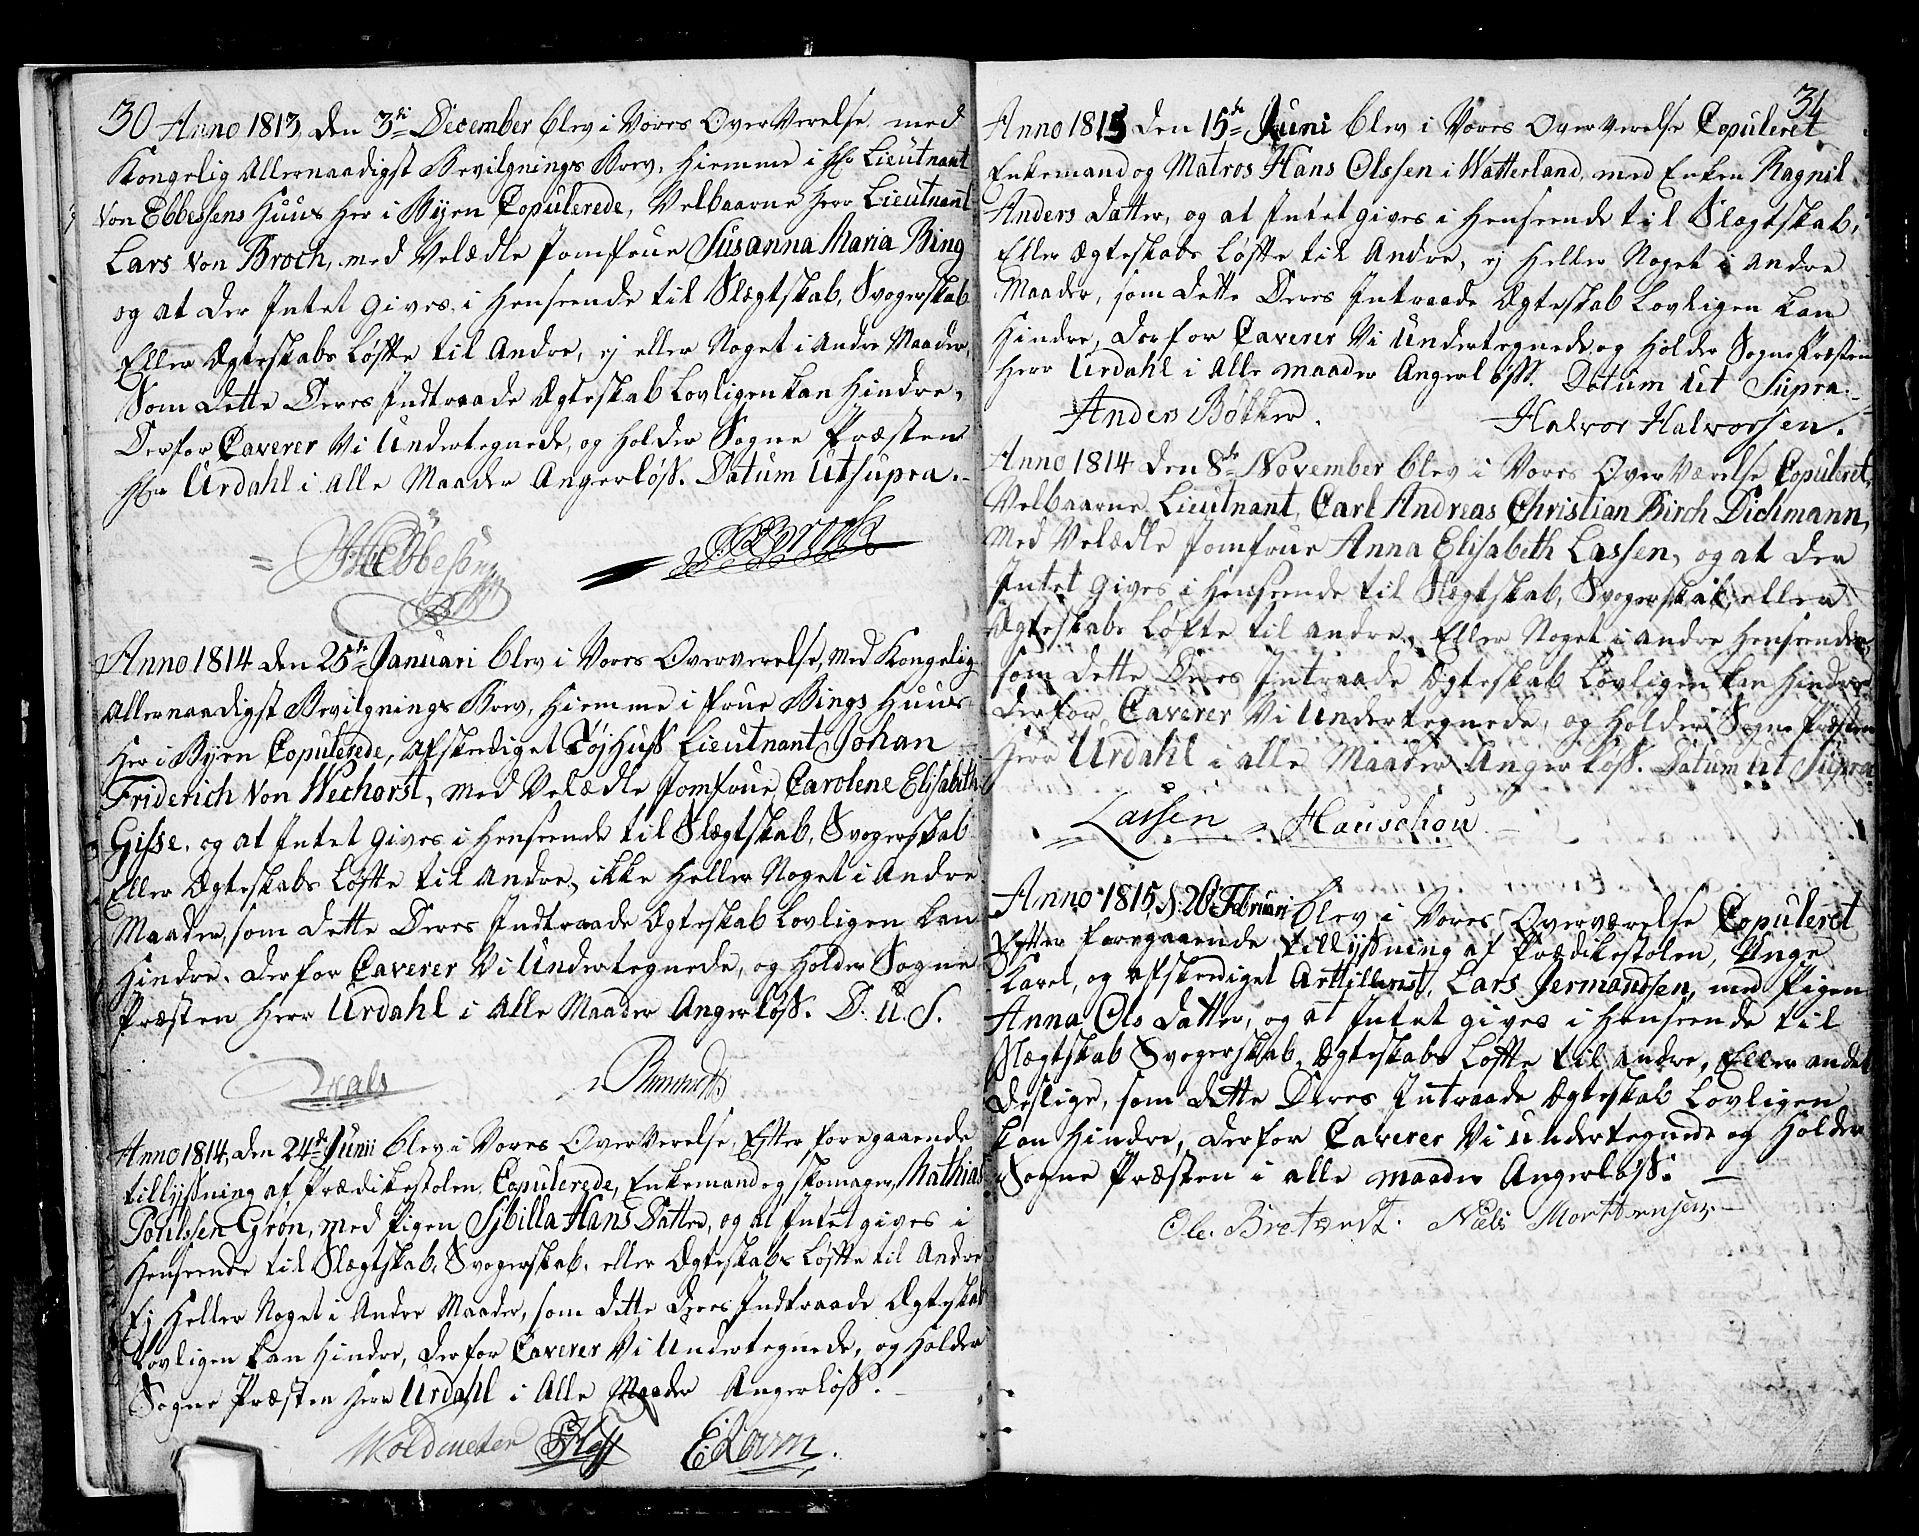 SAO, Fredrikstad prestekontor Kirkebøker, F/Fa/L0003: Ministerialbok nr. 3, 1805-1816, s. 30-31